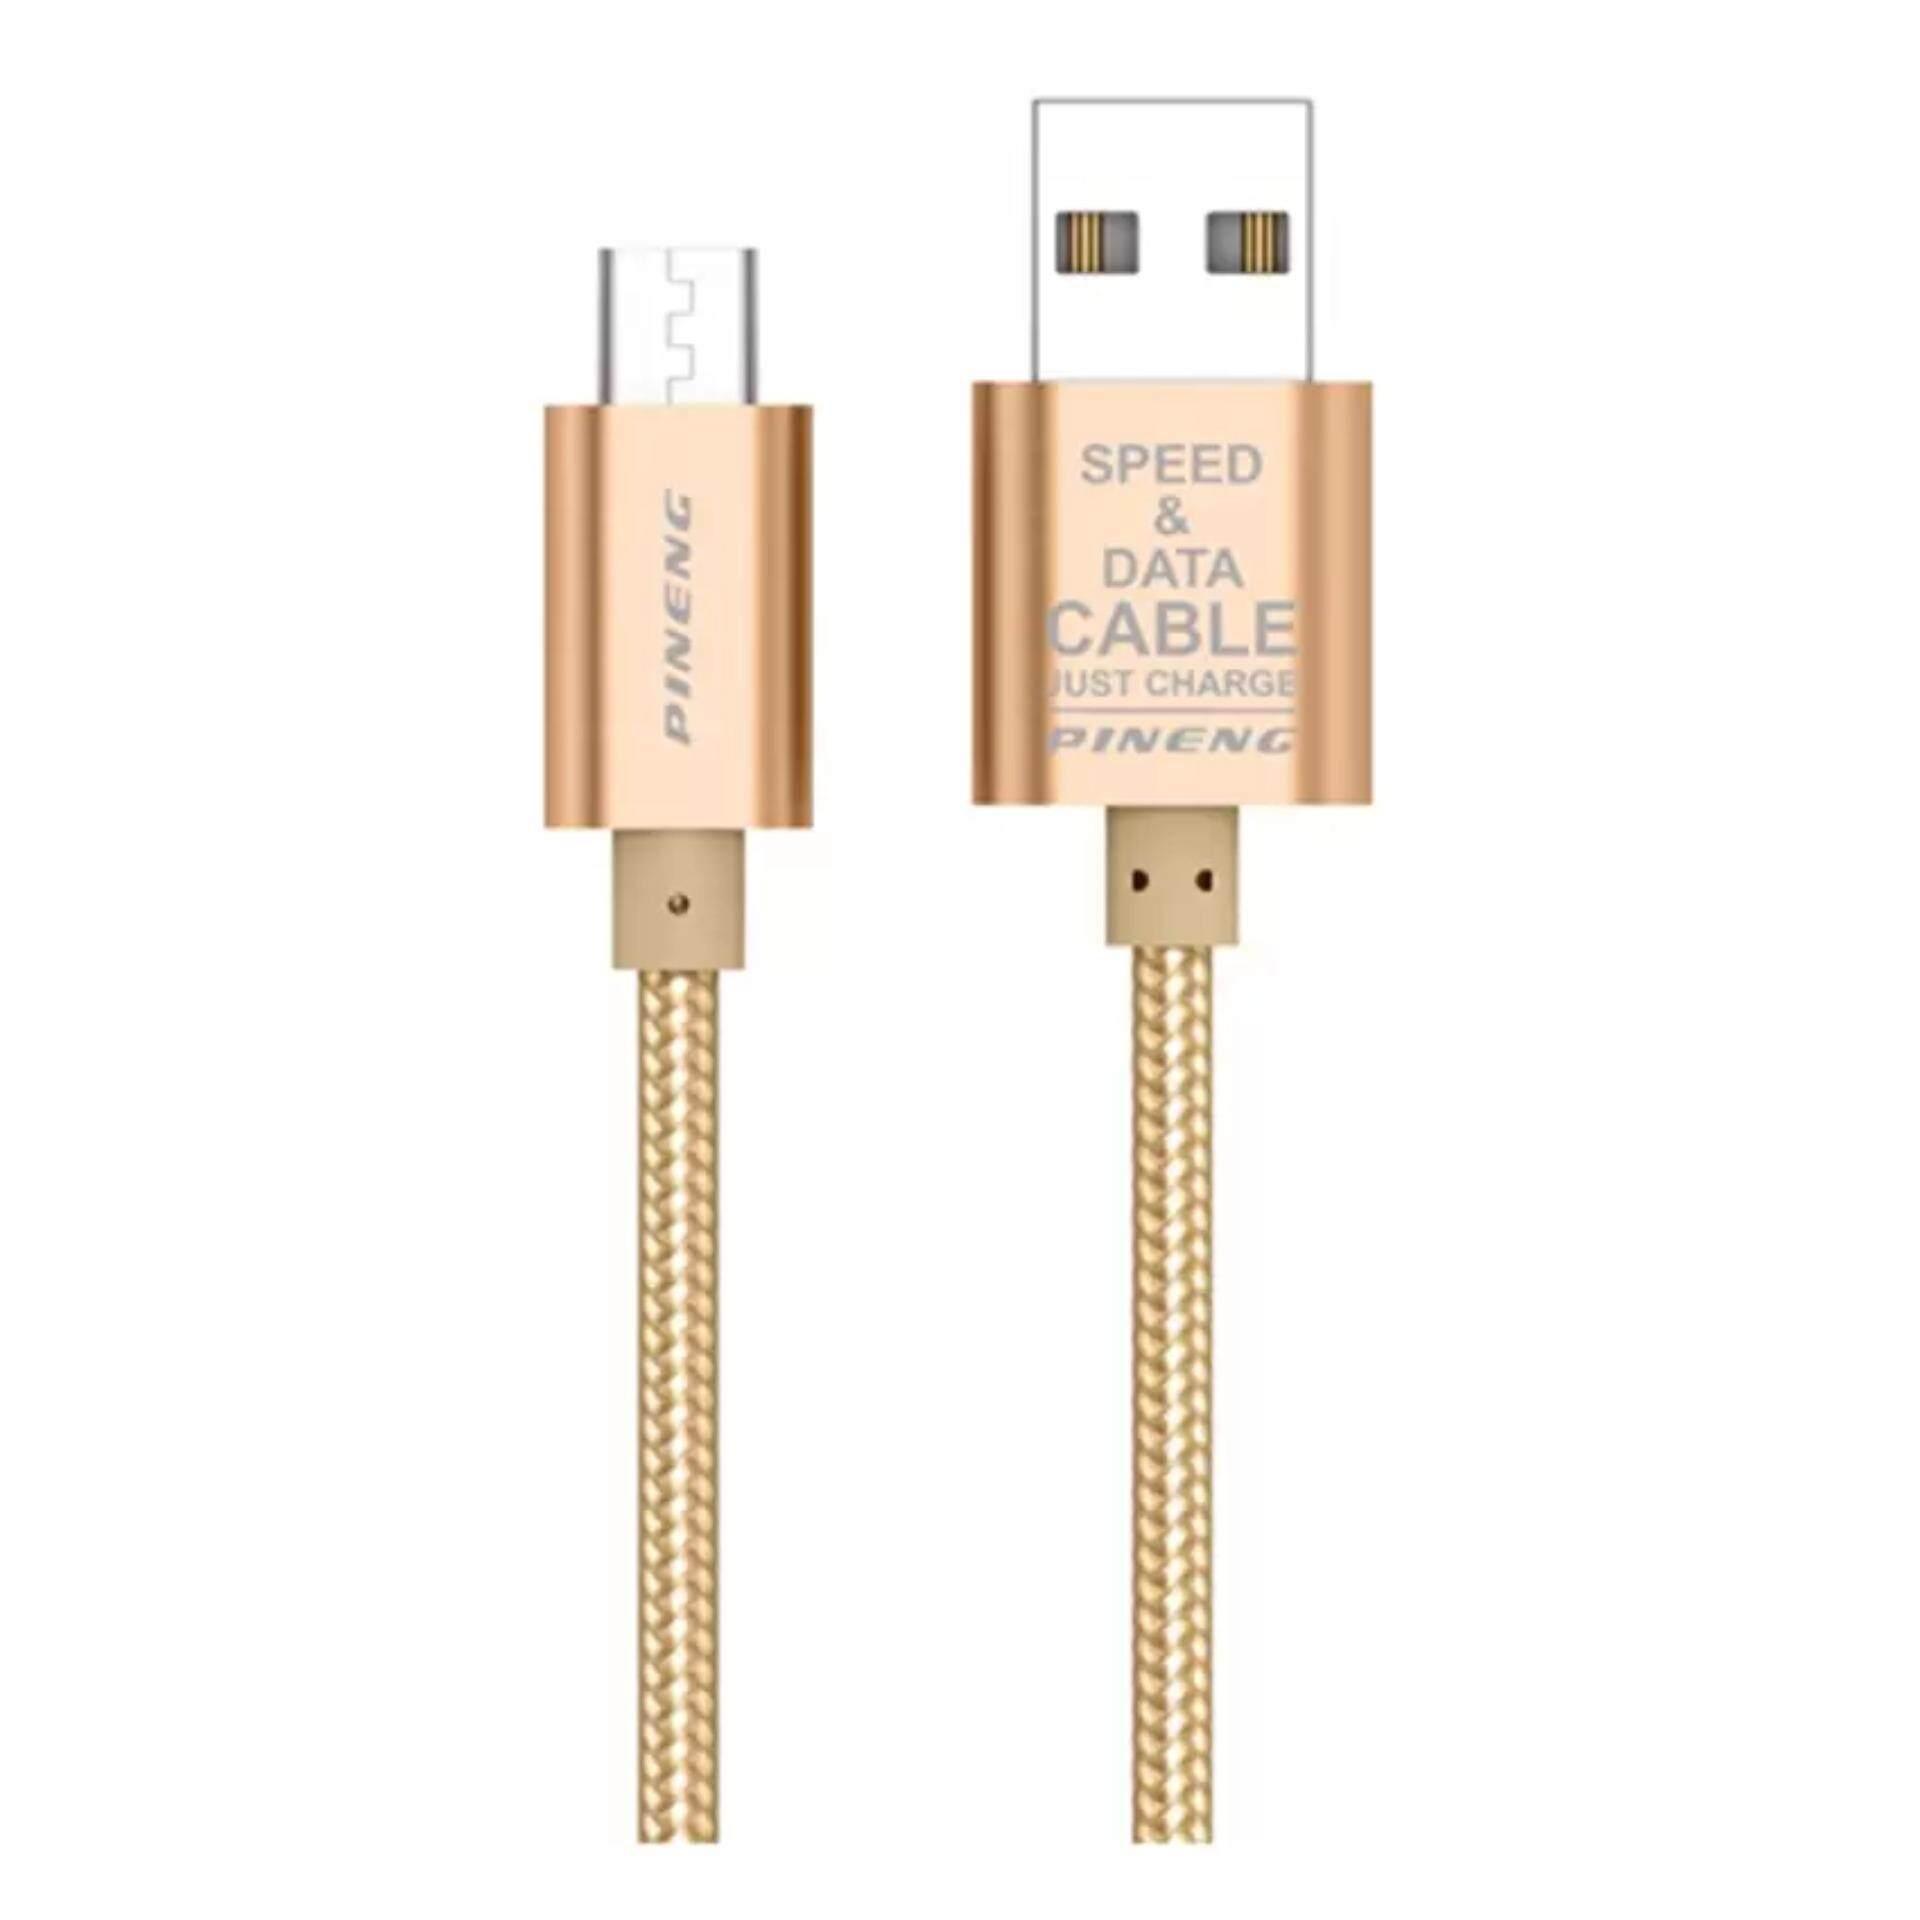 PINENG PN-306 Kabel Usb Mikro untuk Samsung/Asus/HTC/Lenovo/Vivo/Oppo/XiaoMi Dll -Internasional